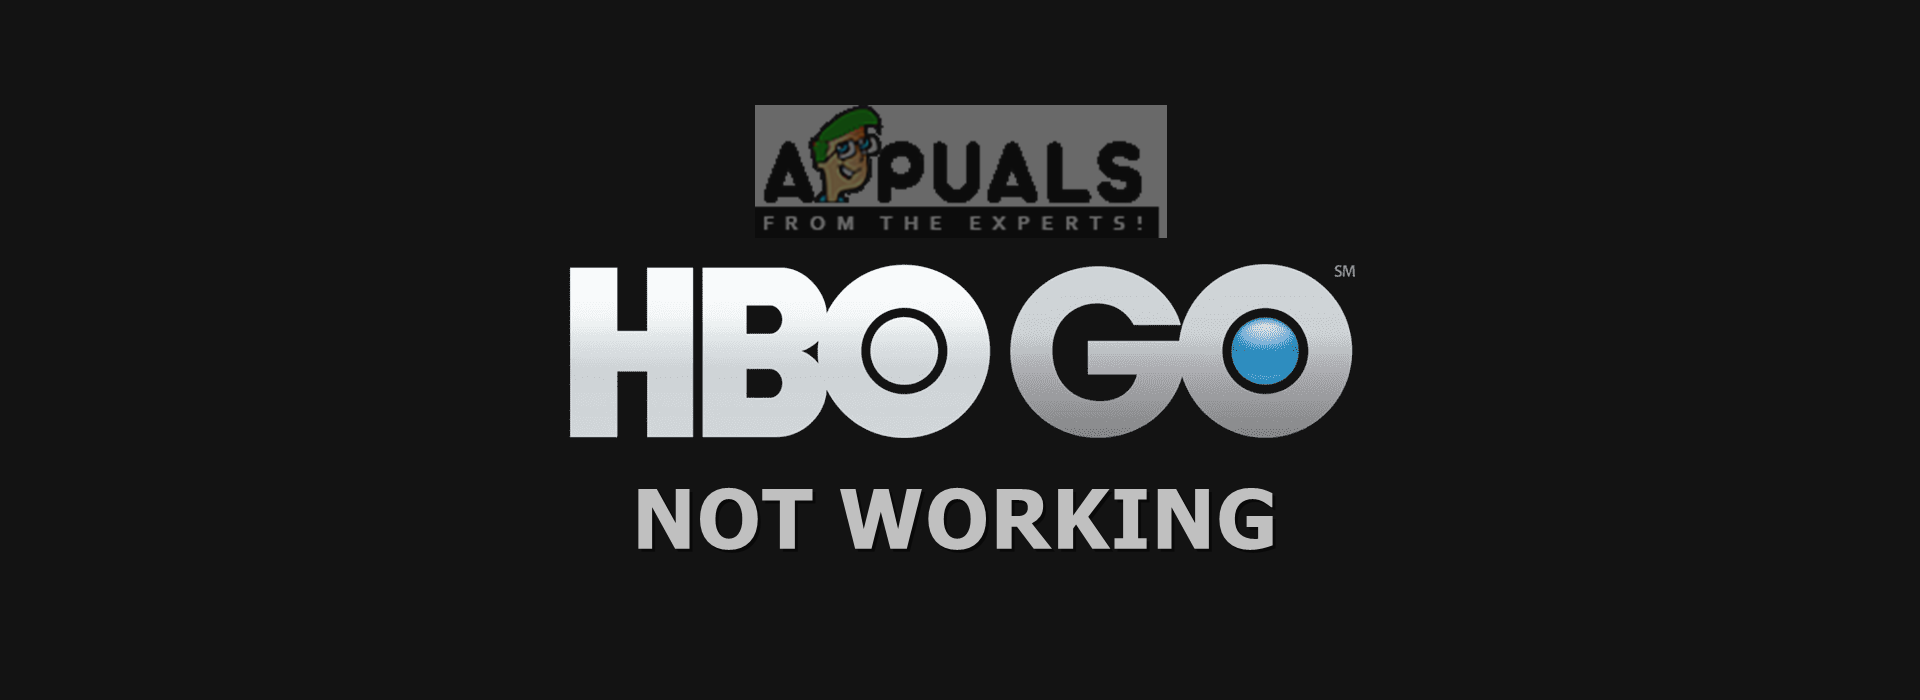 Fix: HBO GO not Working - Appuals com